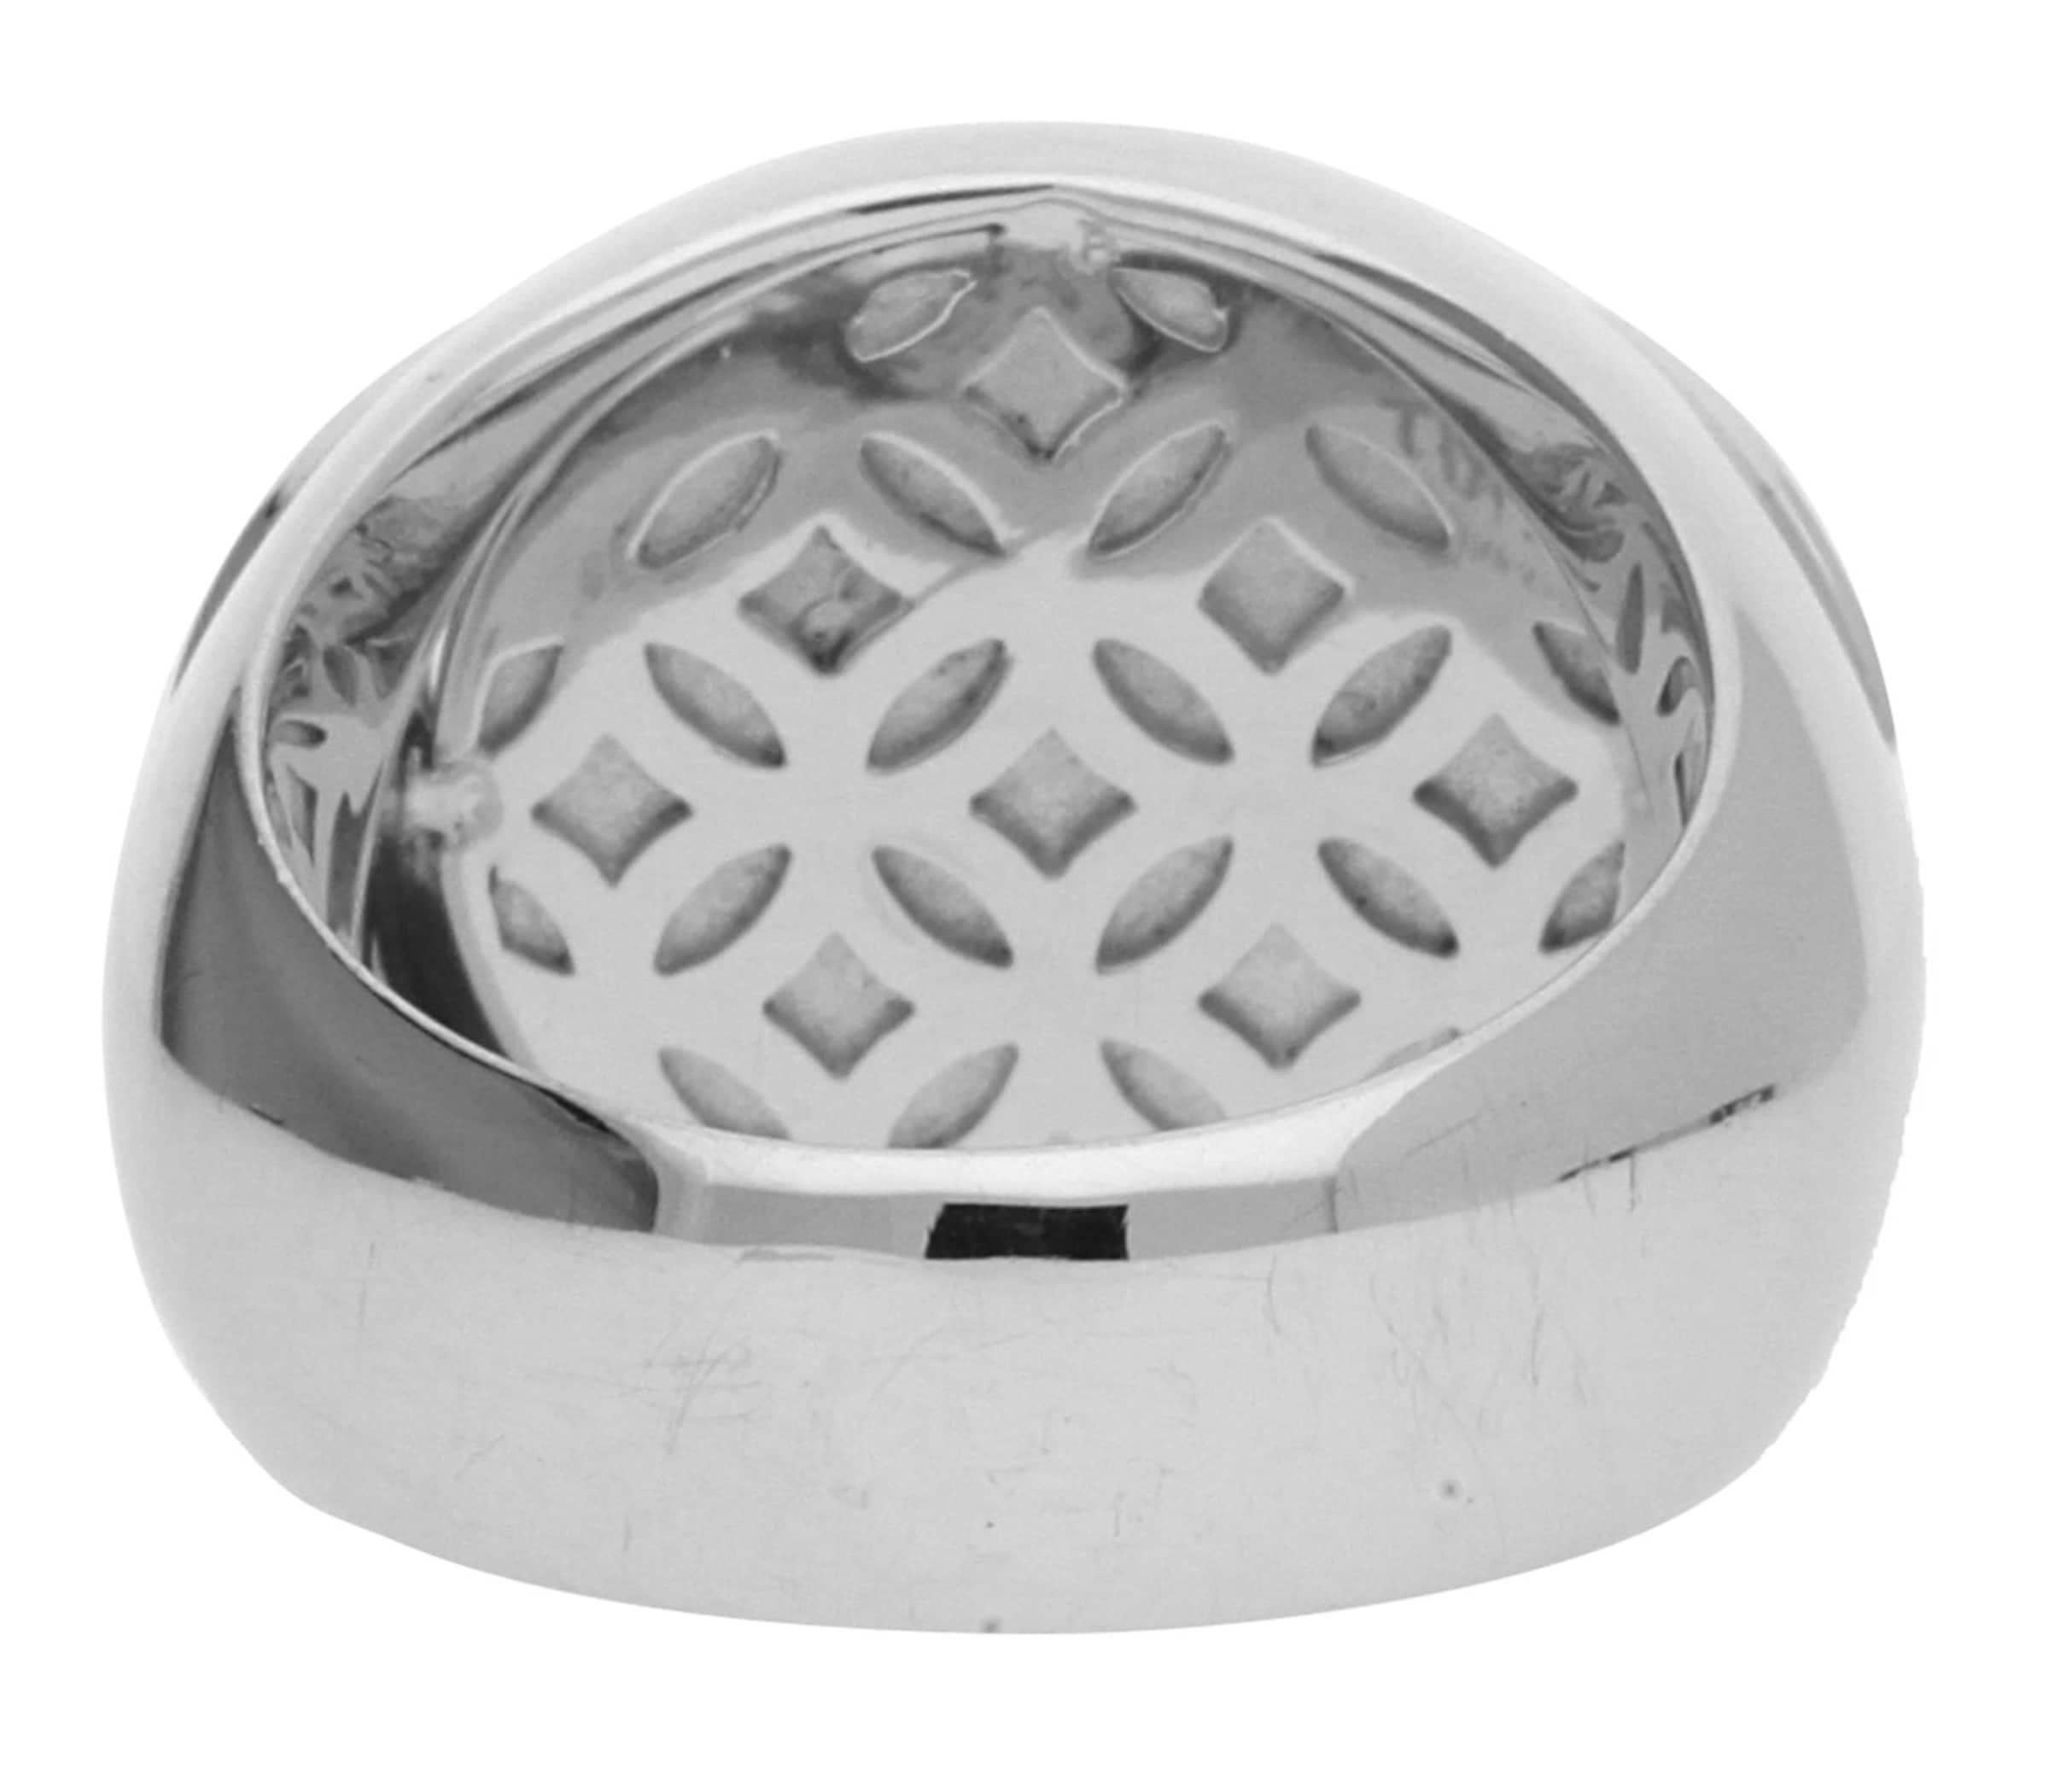 Rabatt-Outlet-Store Rabatt Neue Stile ESPRIT Fingerring Chione 'ELRG91449A' 0Dect0Wm1